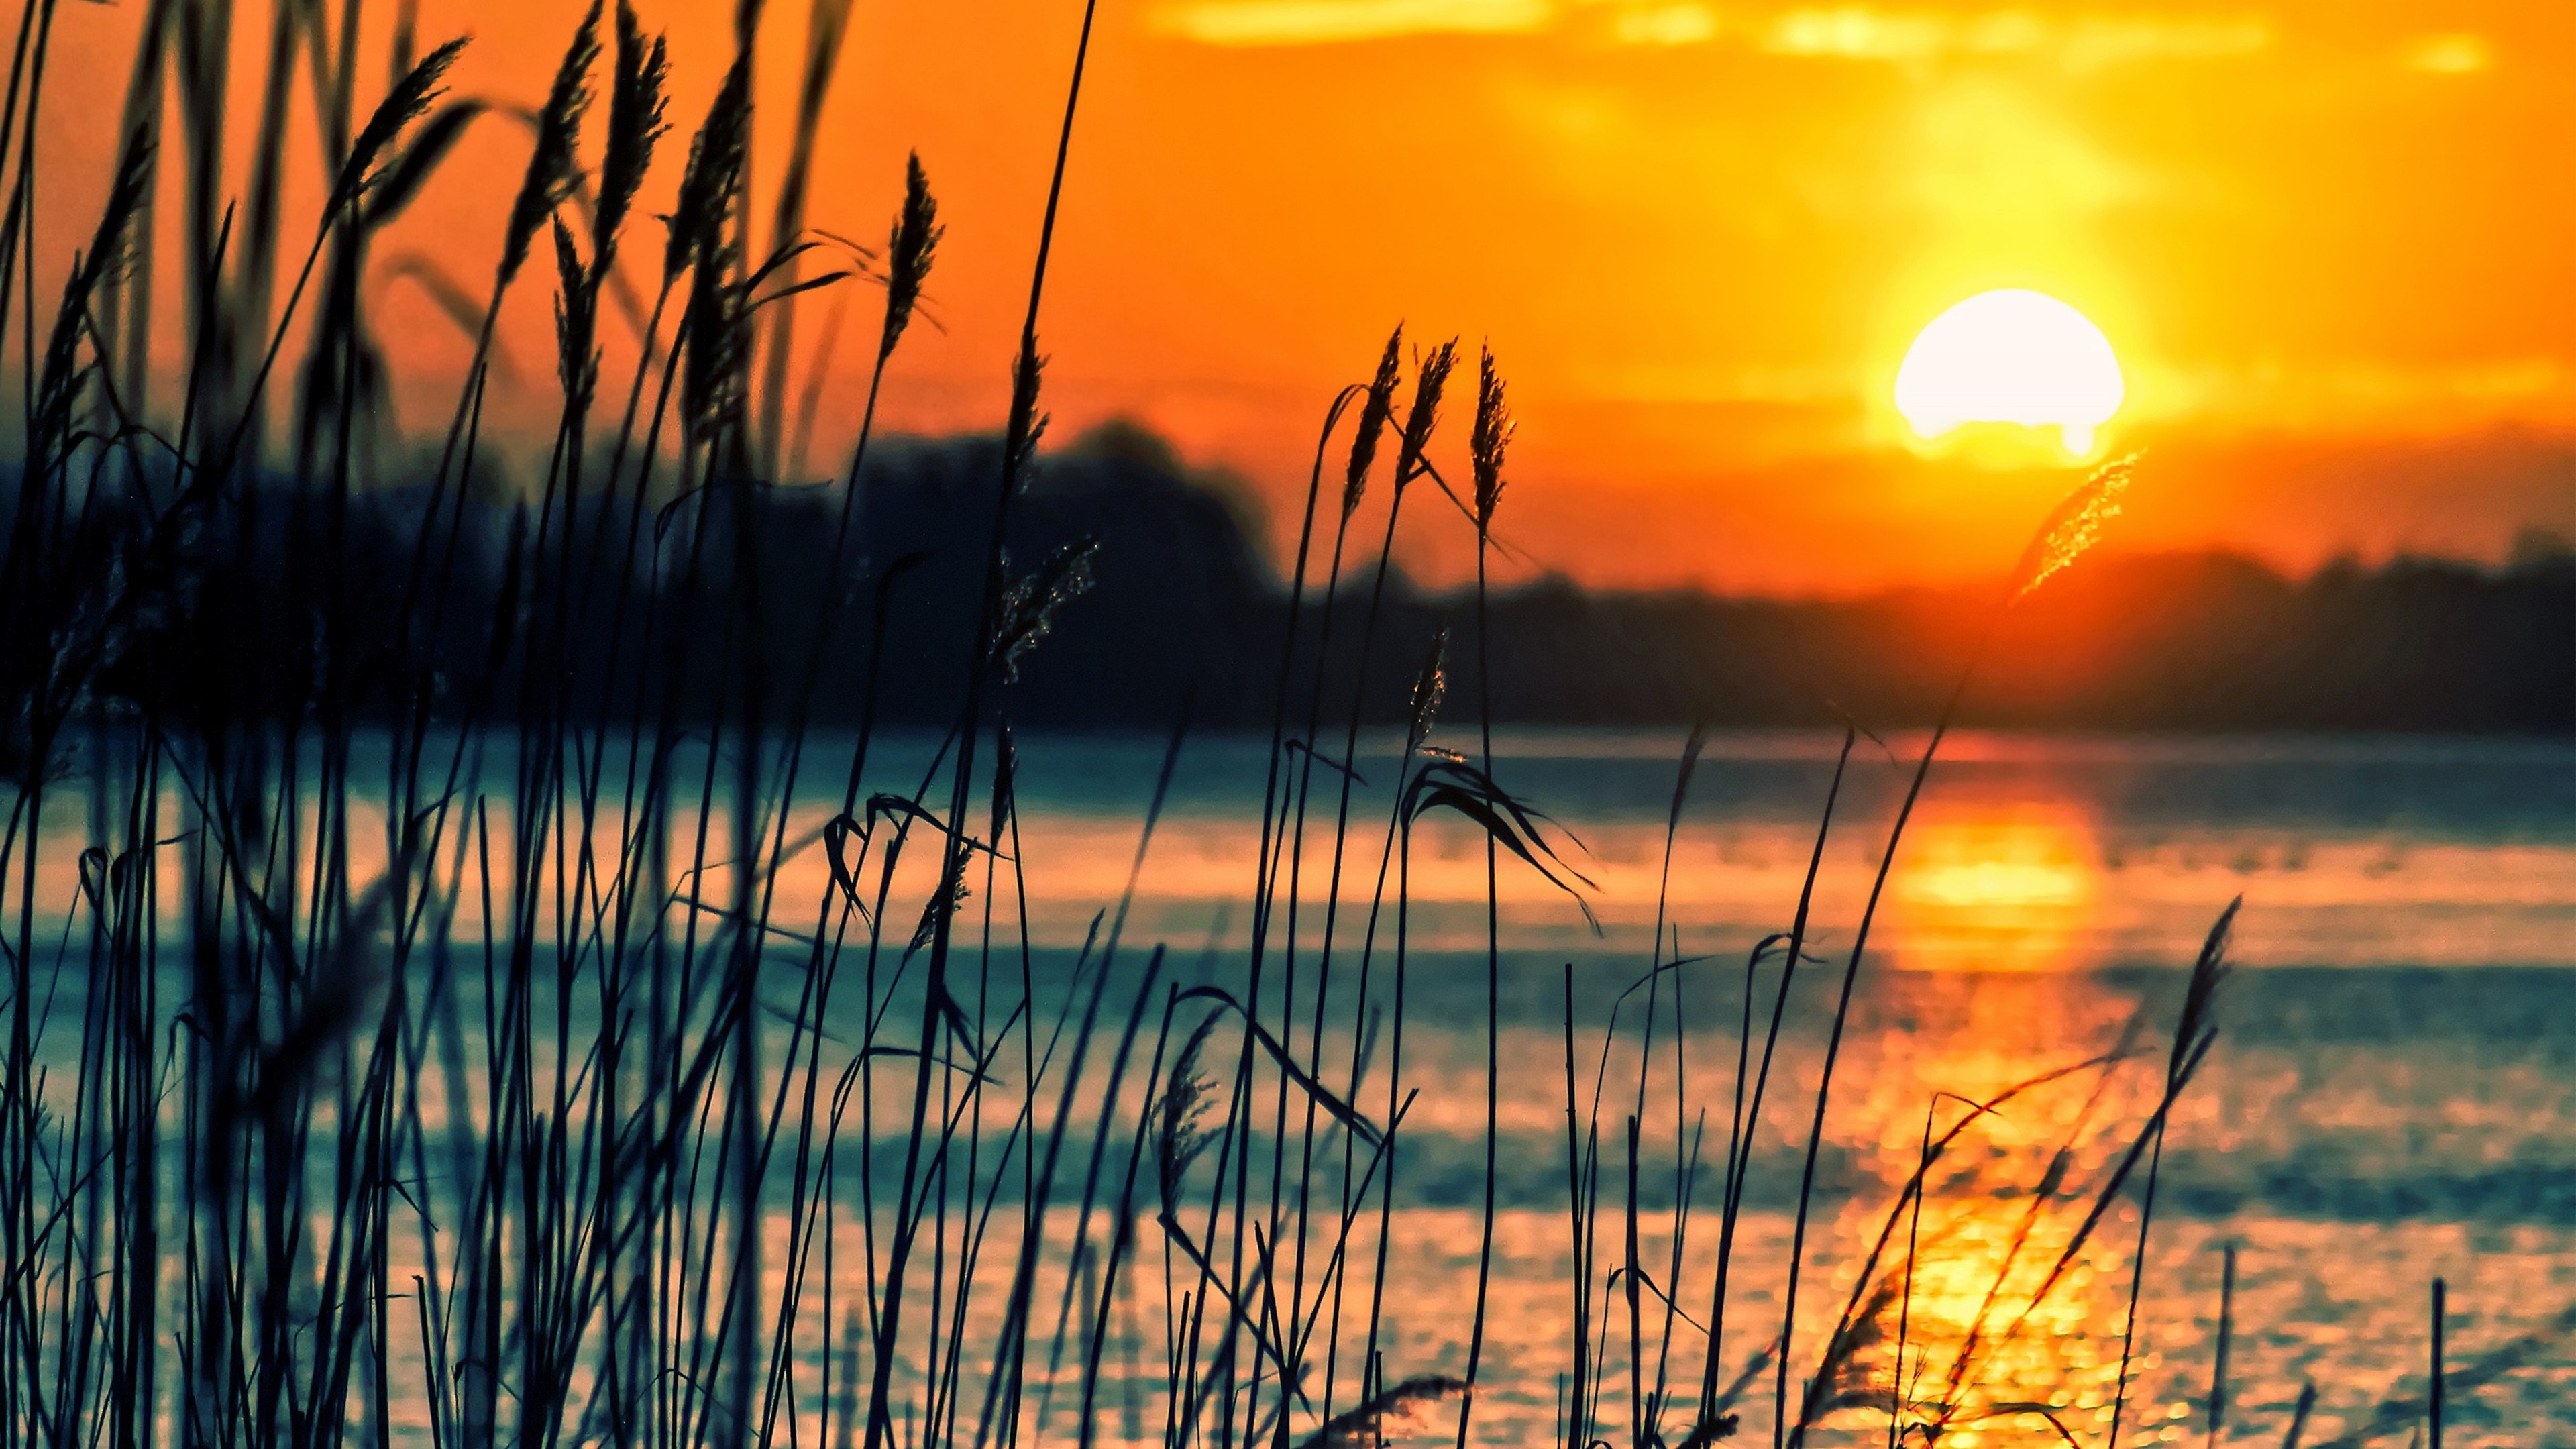 crops sunset lake 4k 1540131385 - Crops Sunset Lake 4k - sunset wallpapers, nature wallpapers, lake wallpapers, fields wallpapers